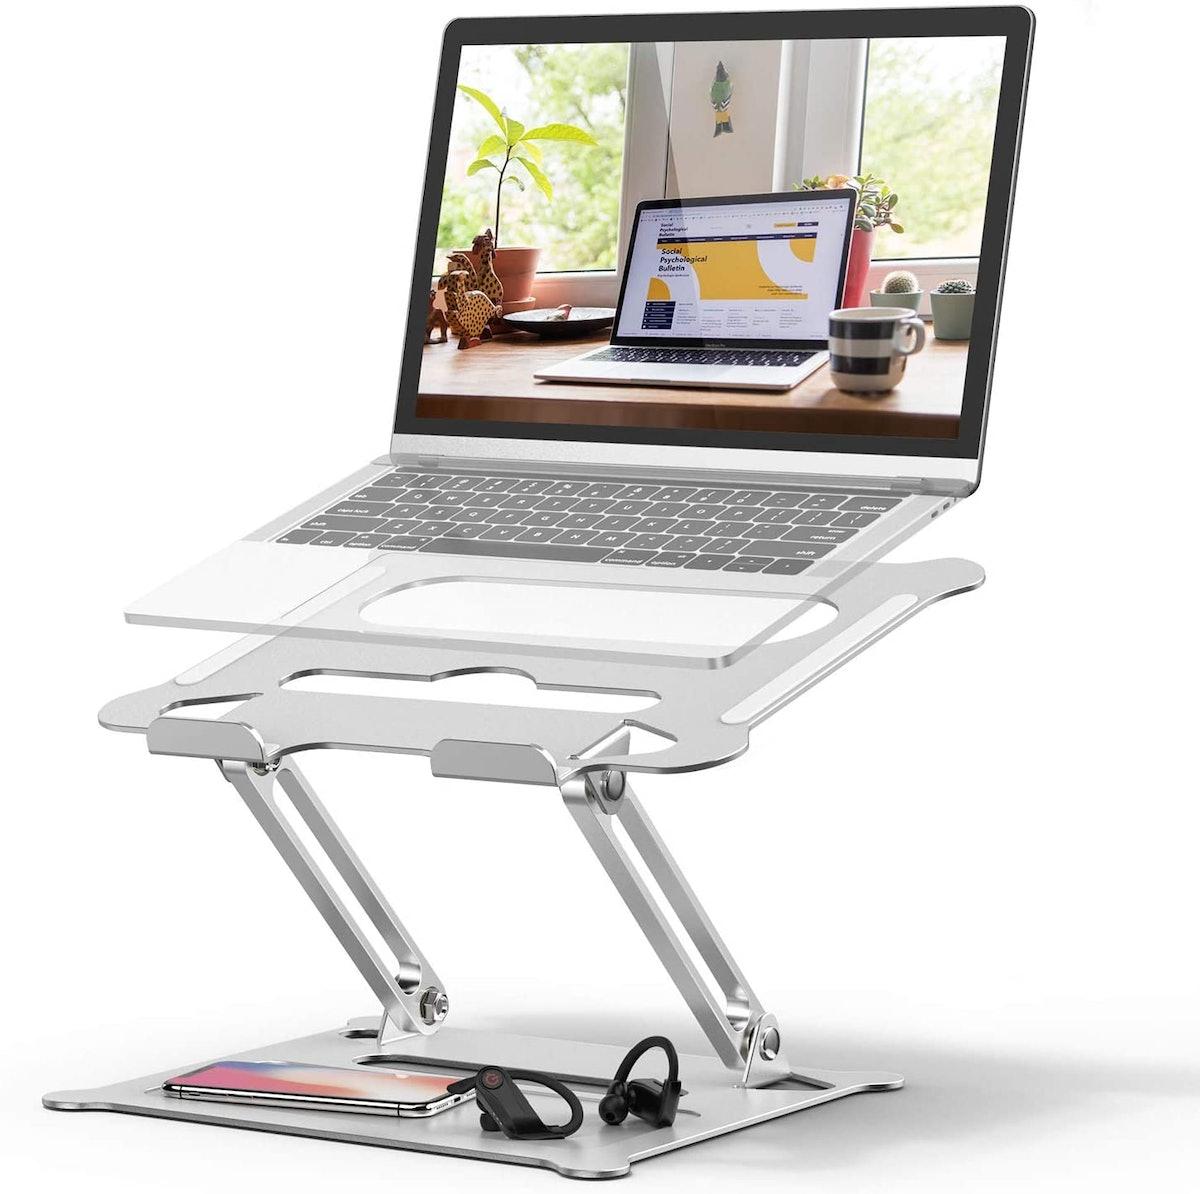 FYSMY Adjustable Laptop Stand